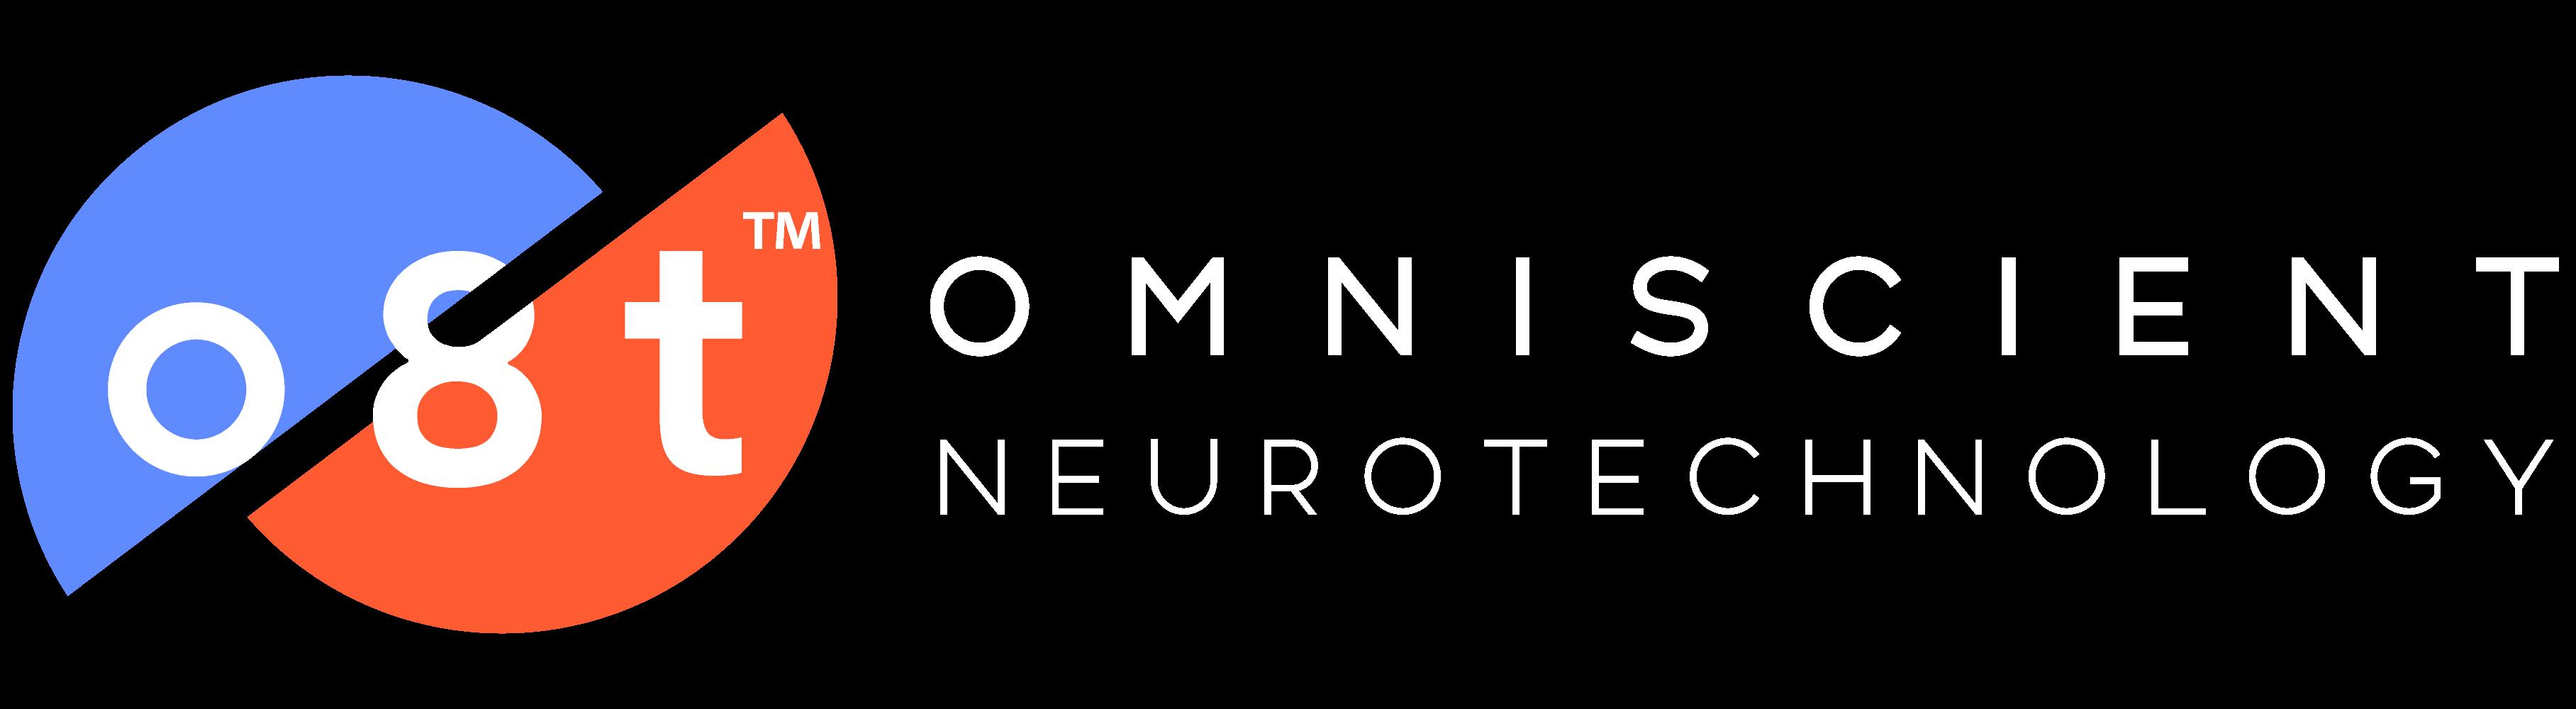 o8t_omniscient_Logo_RGB_Horizontal_MONO